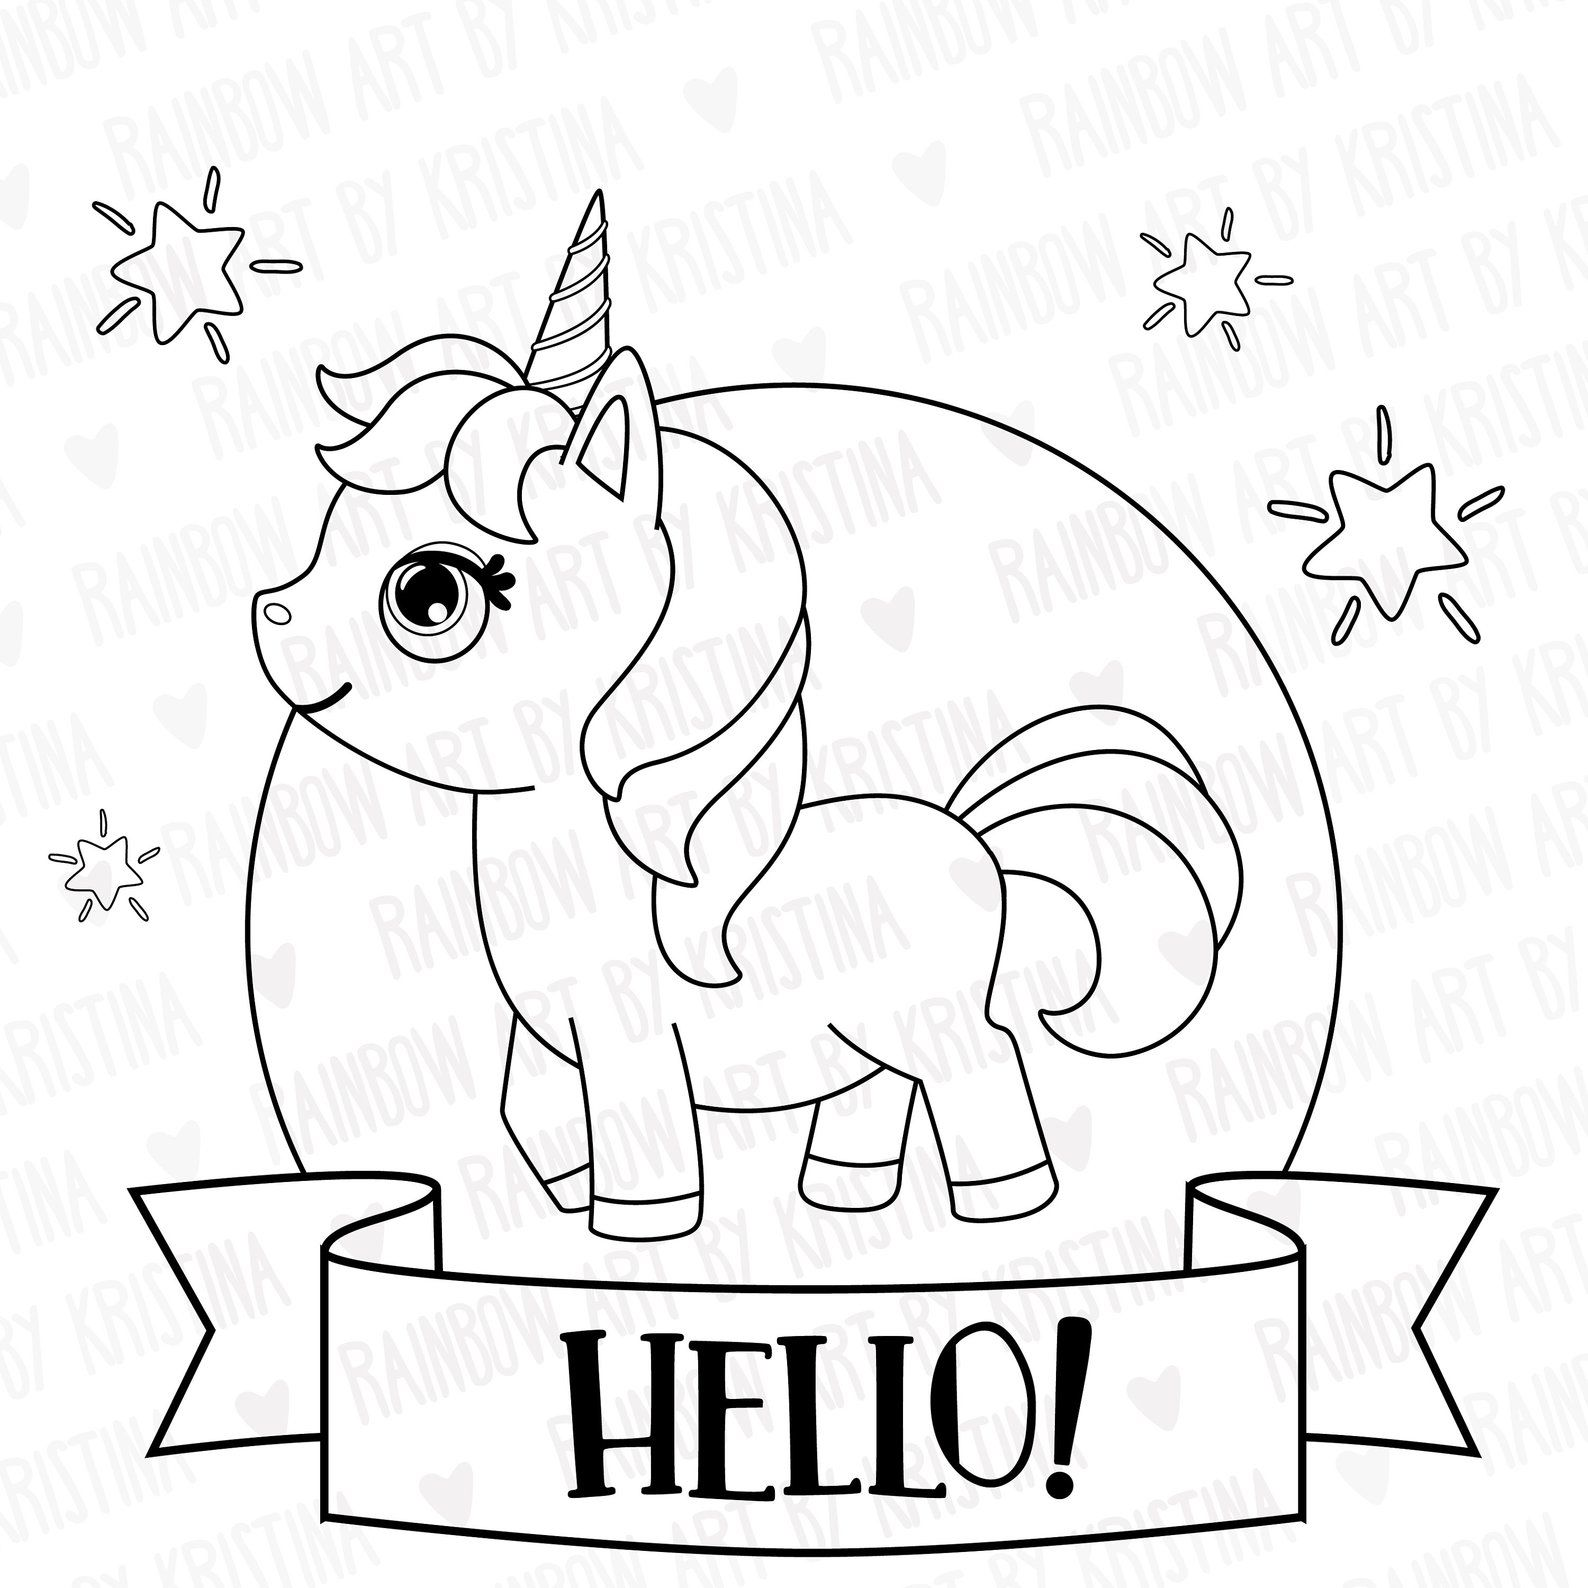 Digital Stamp Cute Birthday Baby Unicorn Clip Art Etsy Baby Unicorn Digital Stamps Birthday Presents For Mom